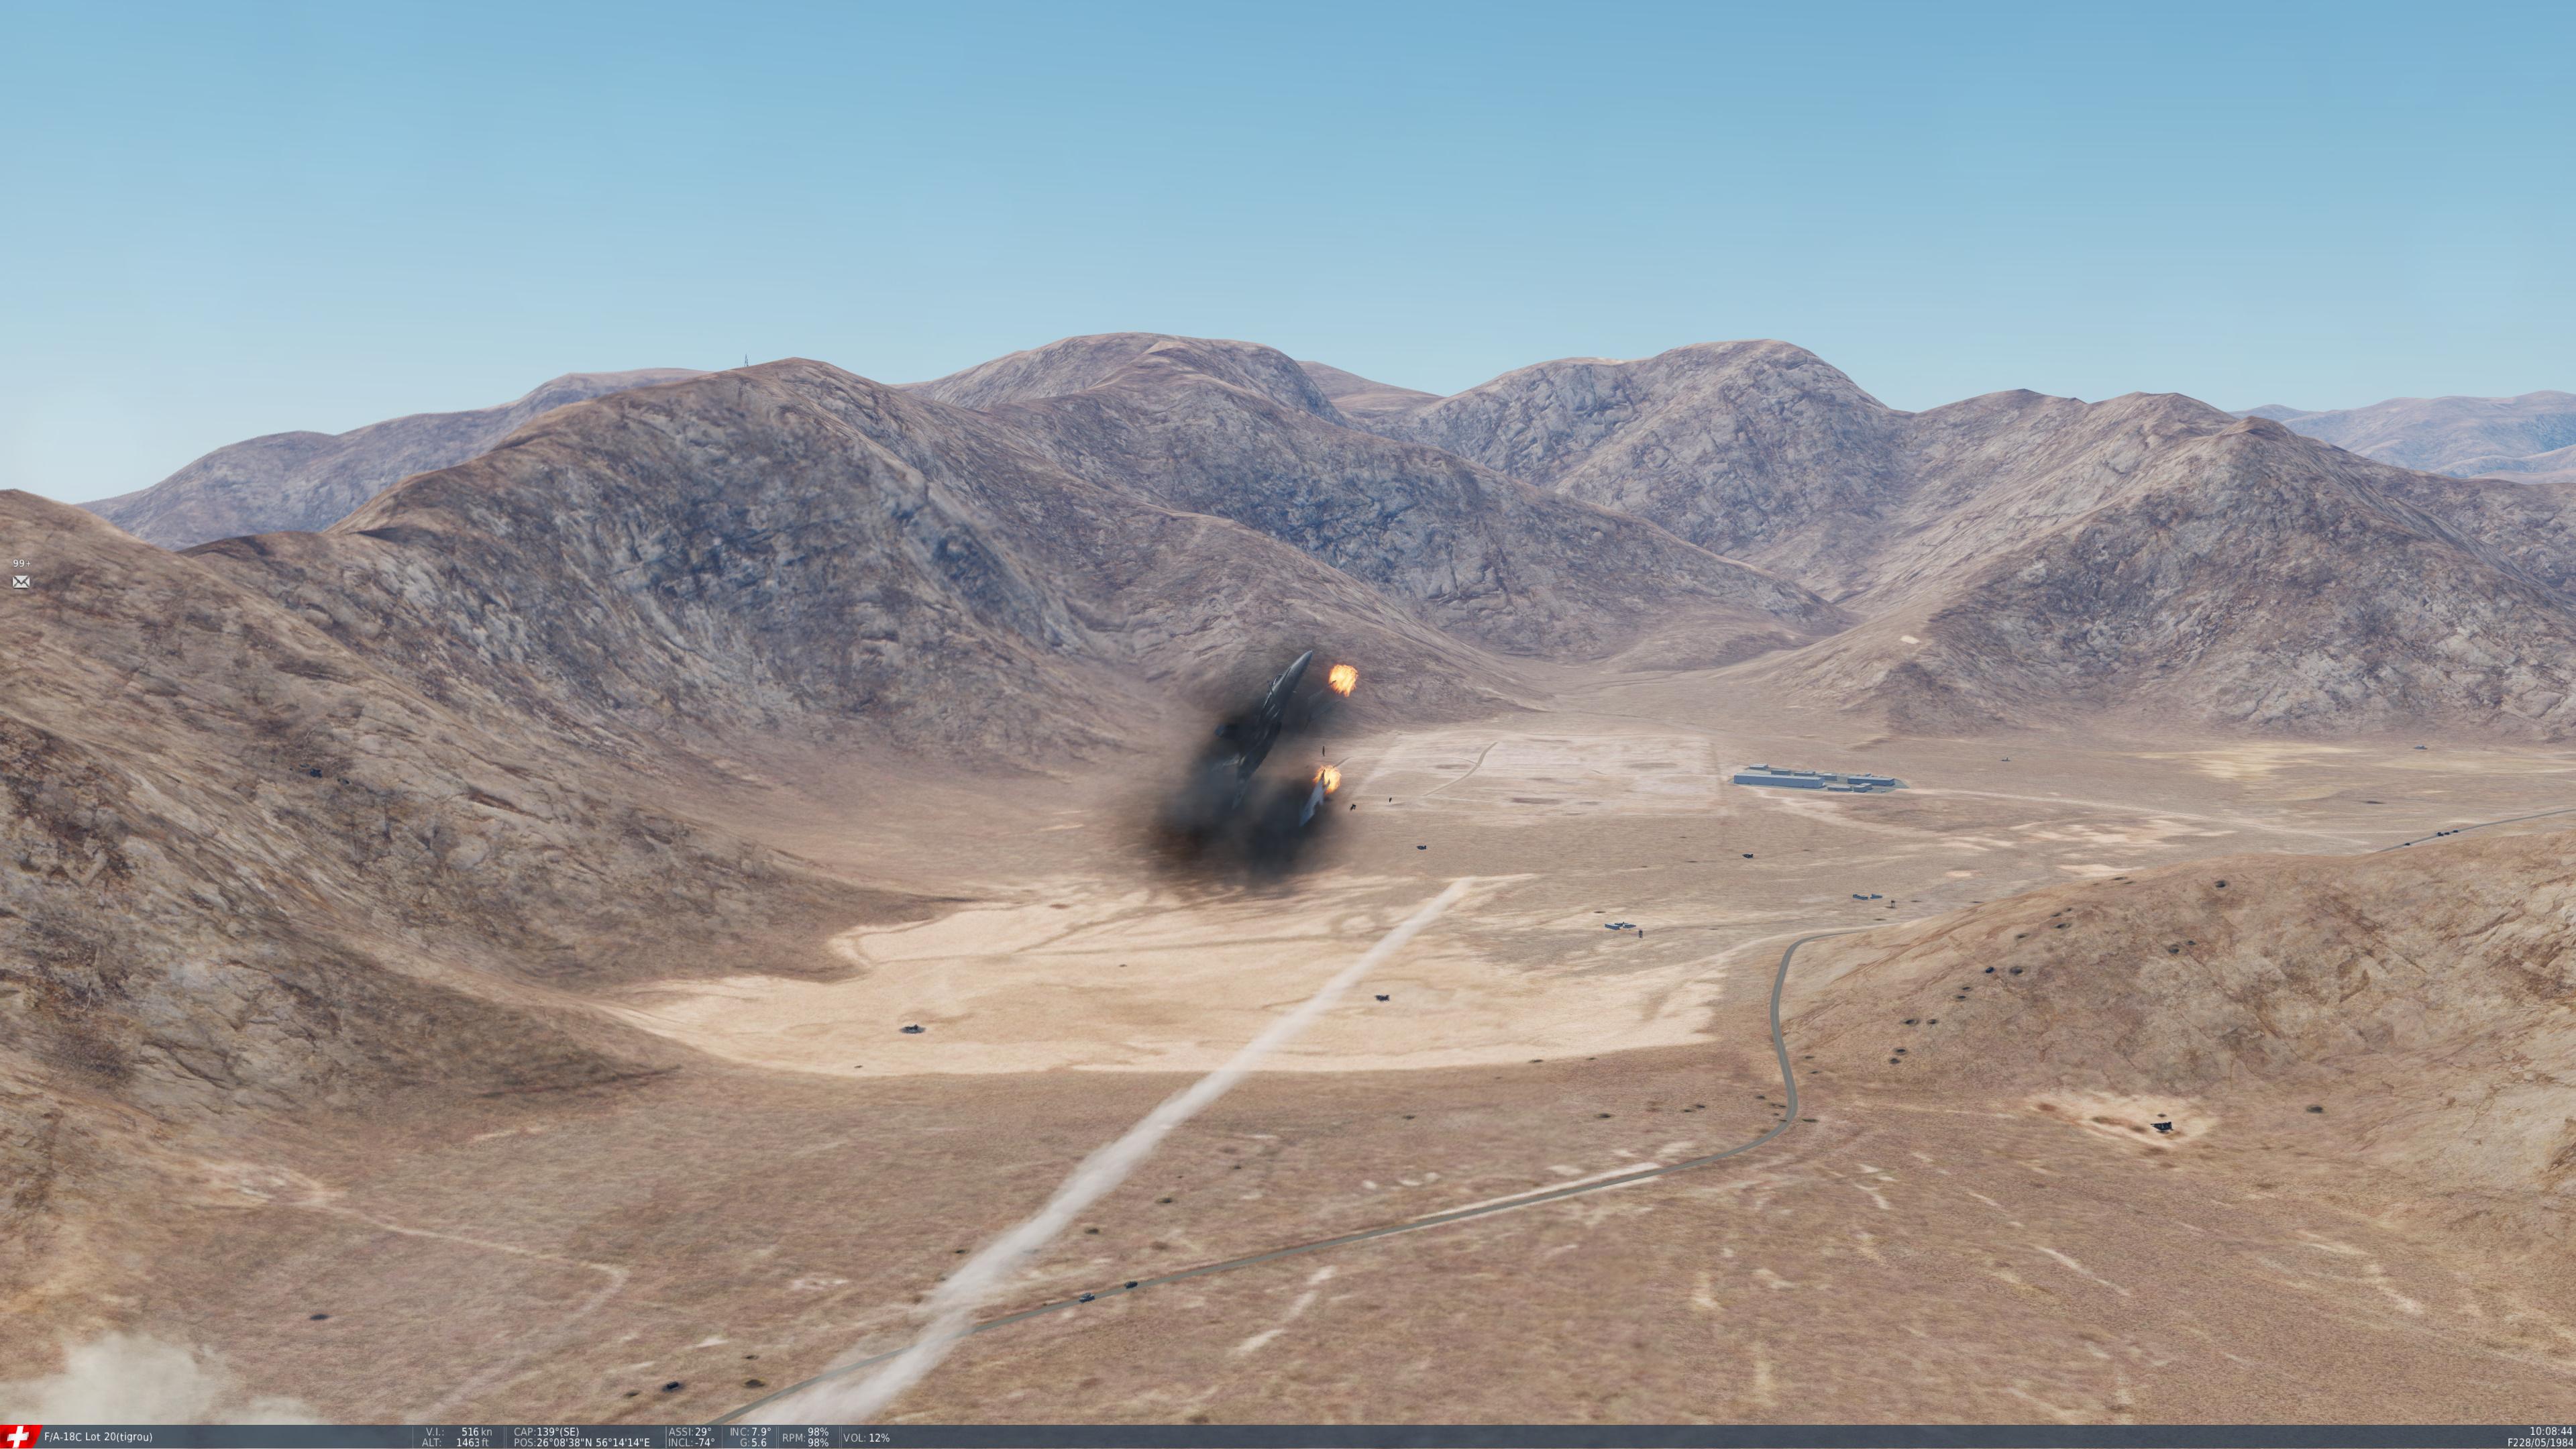 [Cursus UH-1H Huey] Photos de nos missions Bandicam_2021-01-27_00-15-35-405